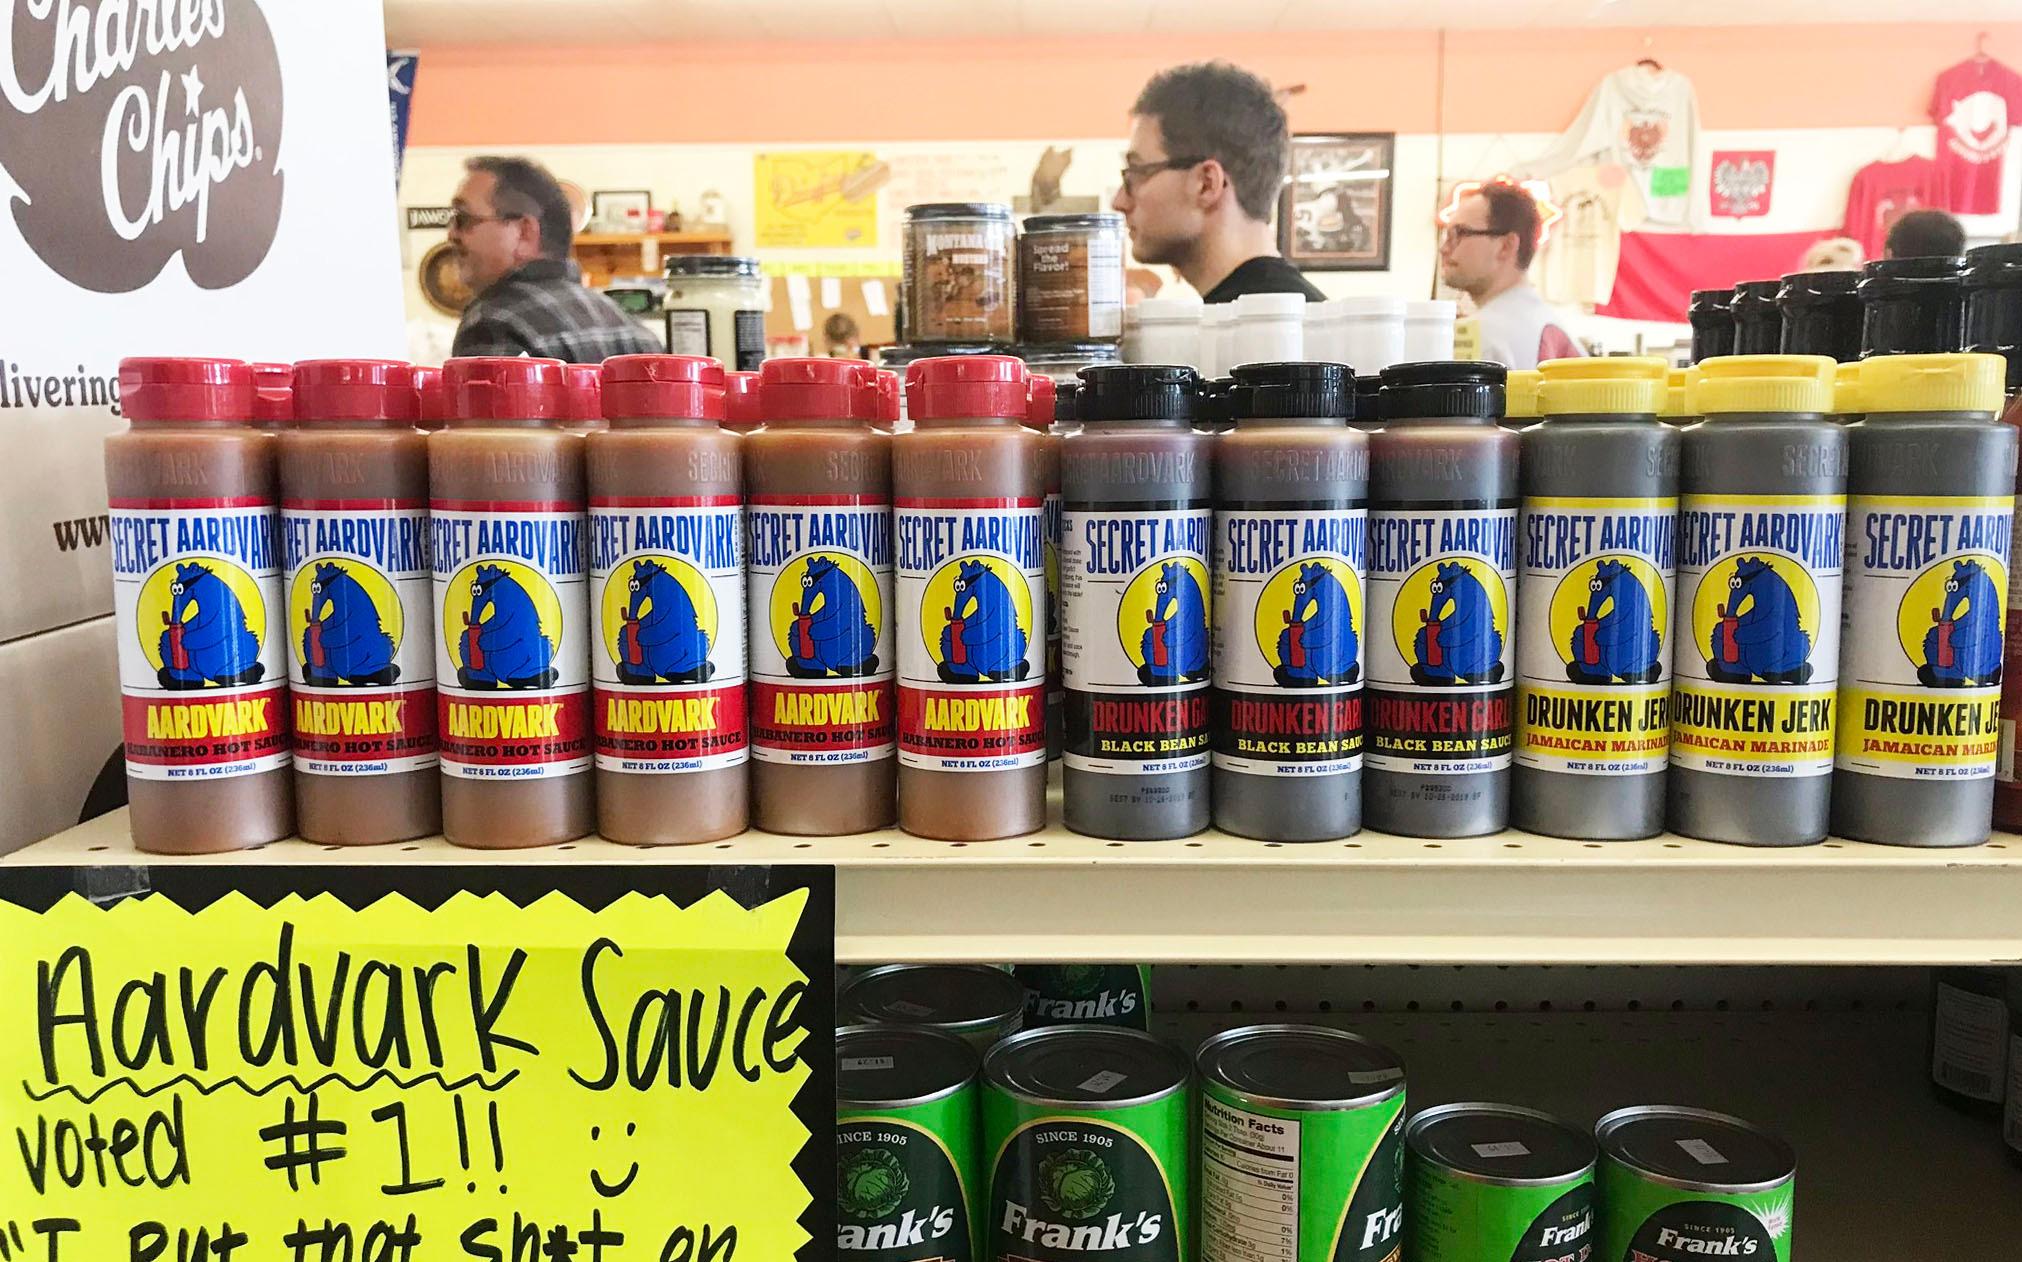 Secret aardvark sauces on a shelf in a shop. Please wait in line in the background